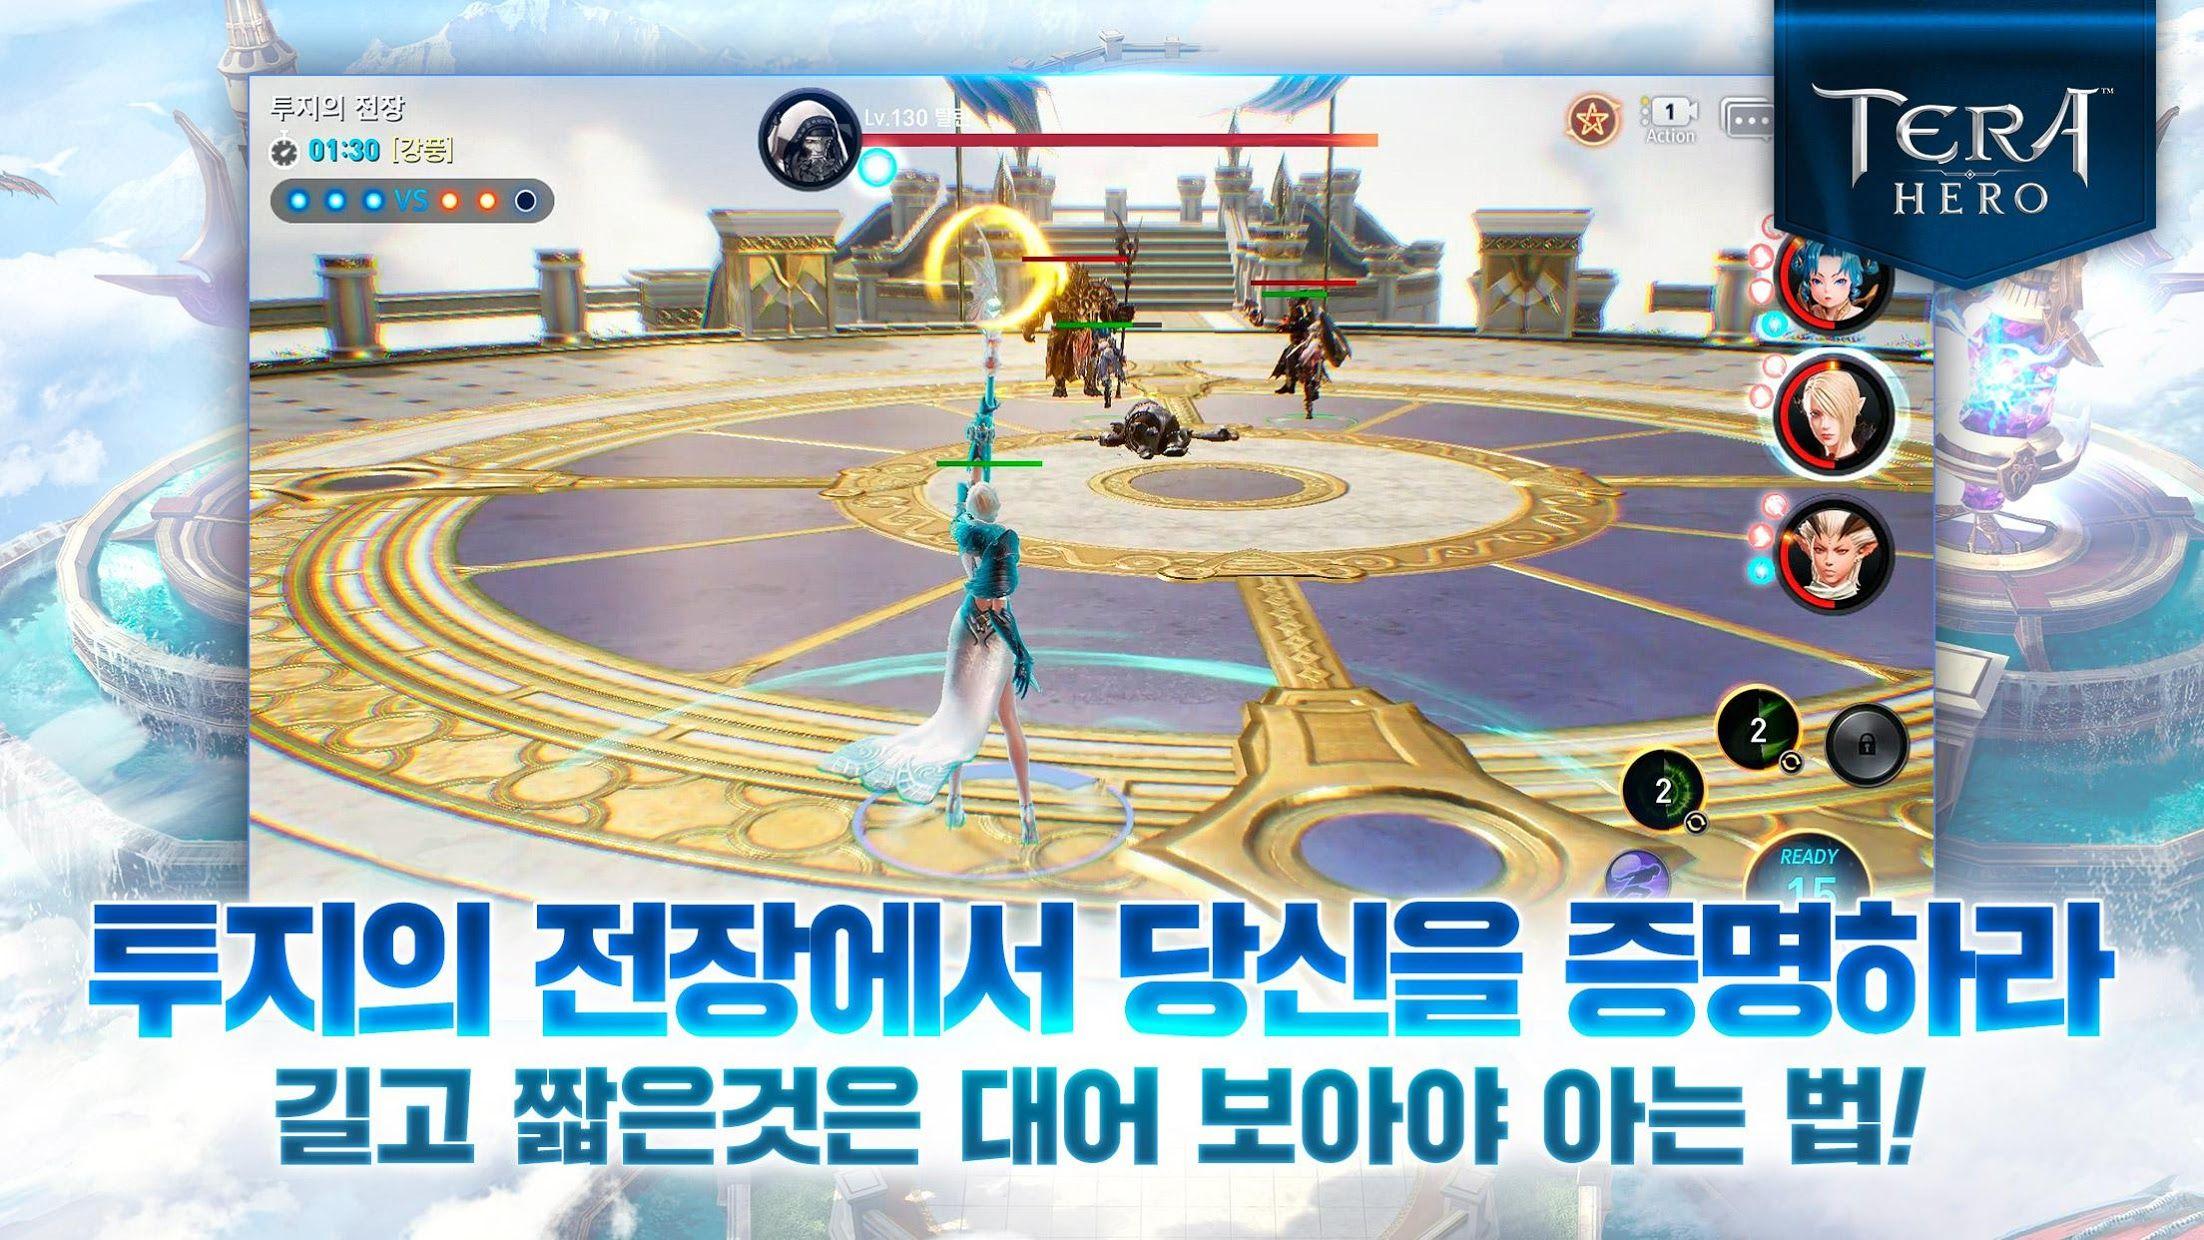 TERA HERO 游戏截图3